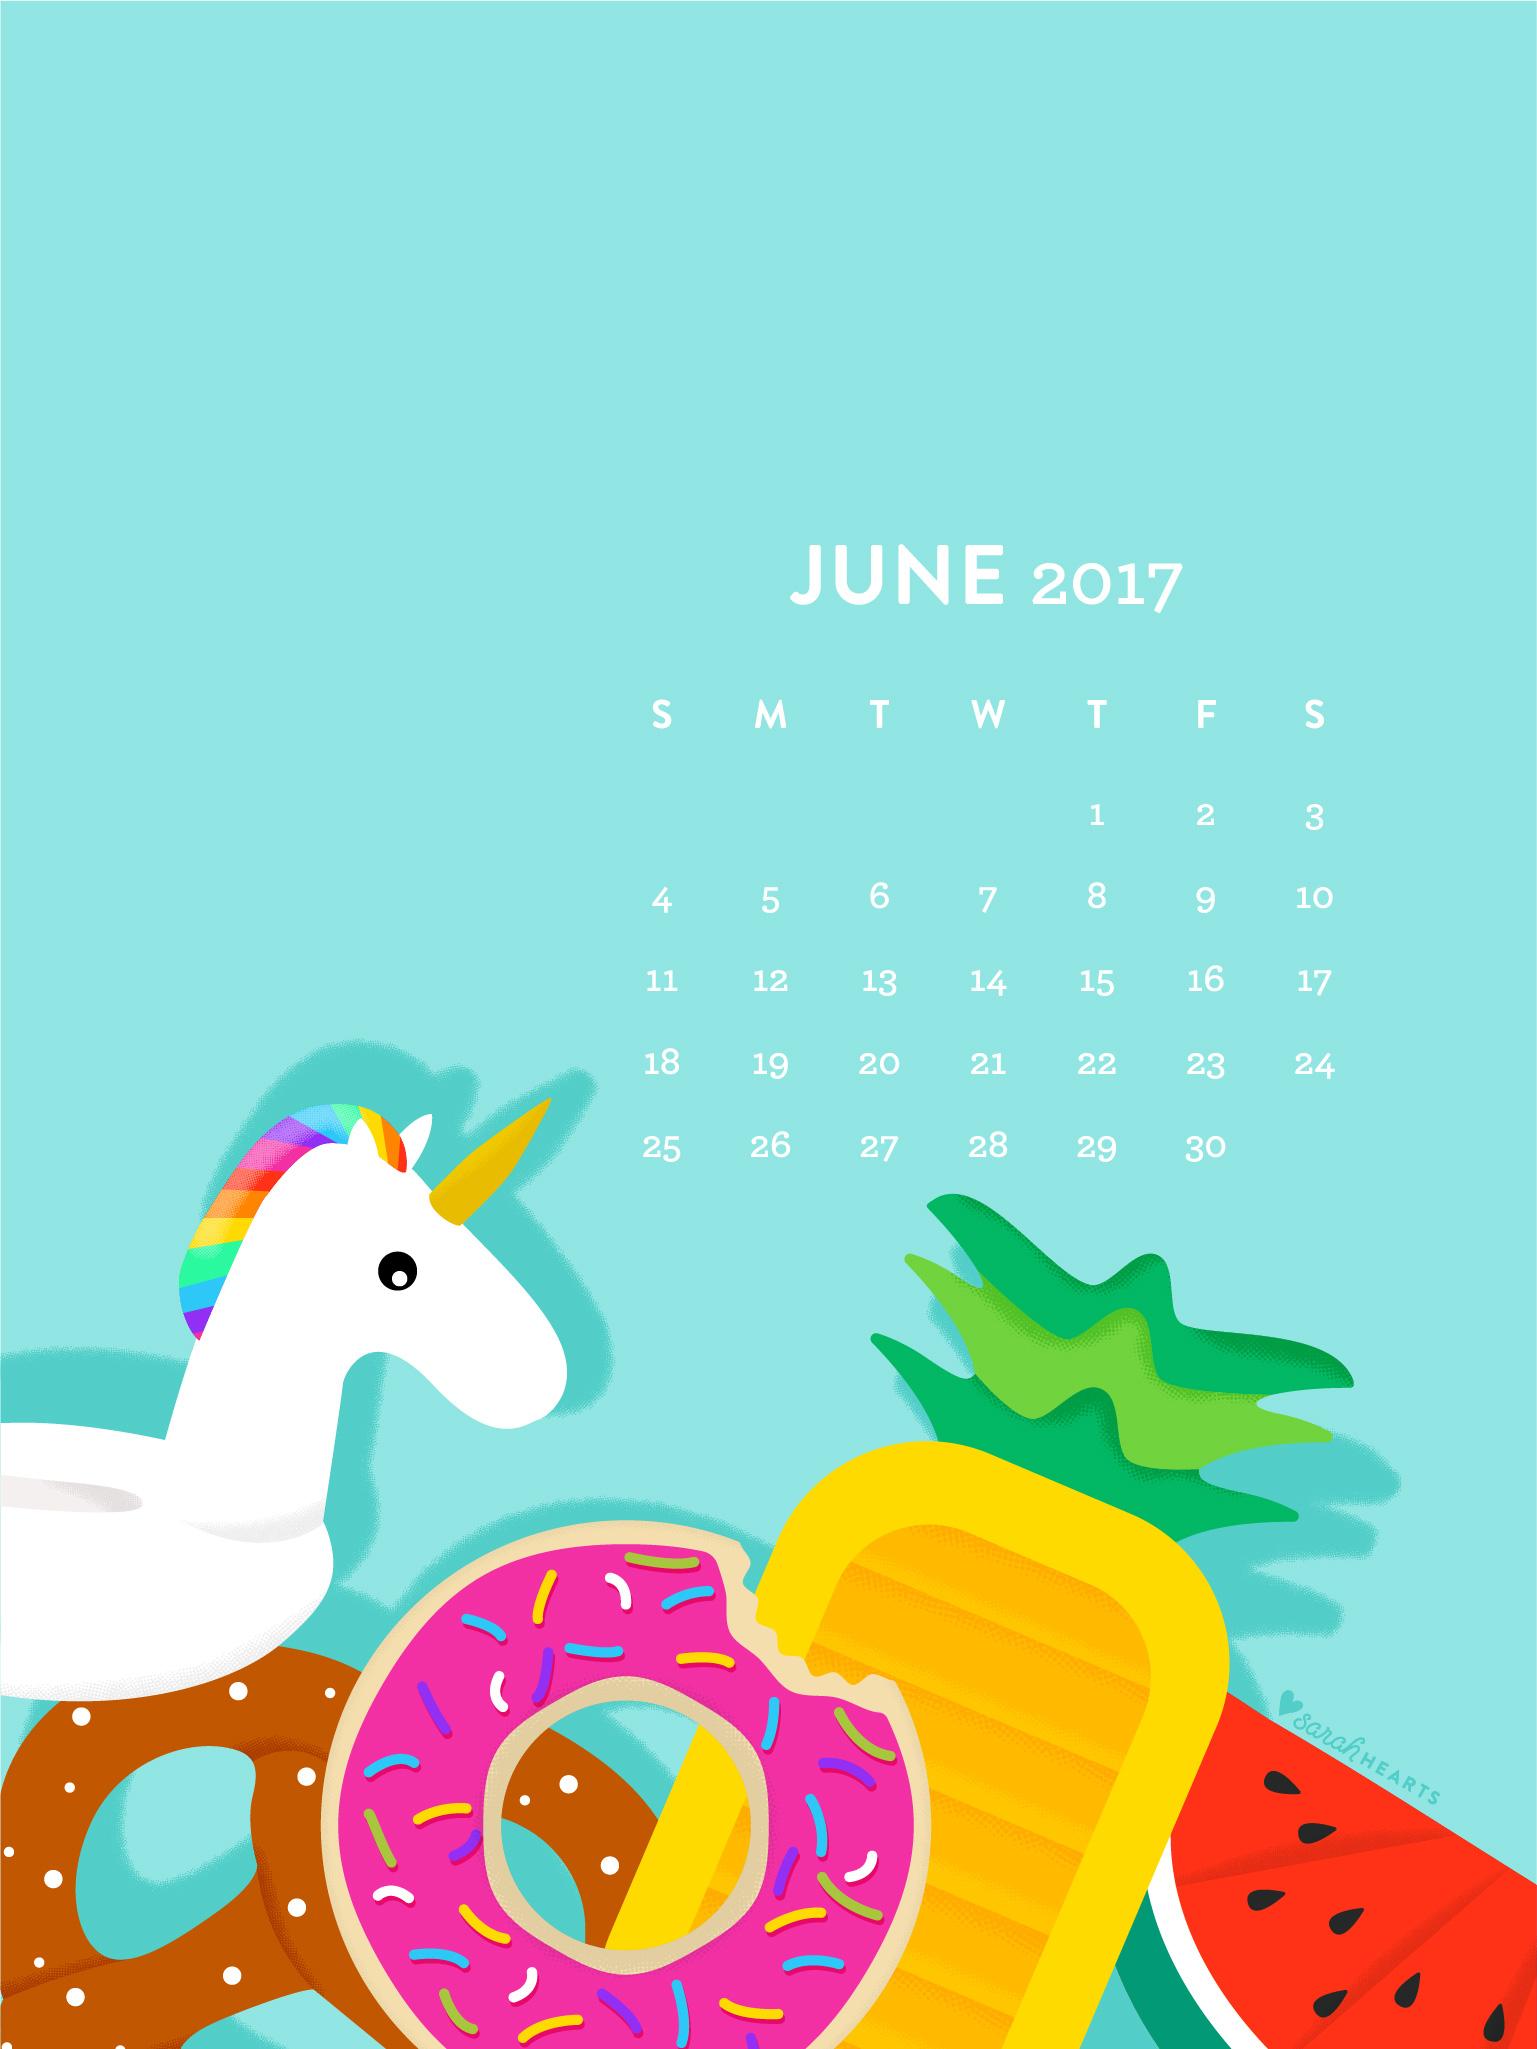 Donut Wallpaper Cute June 2017 Pool Float Calendar Wallpaper Sarah Hearts